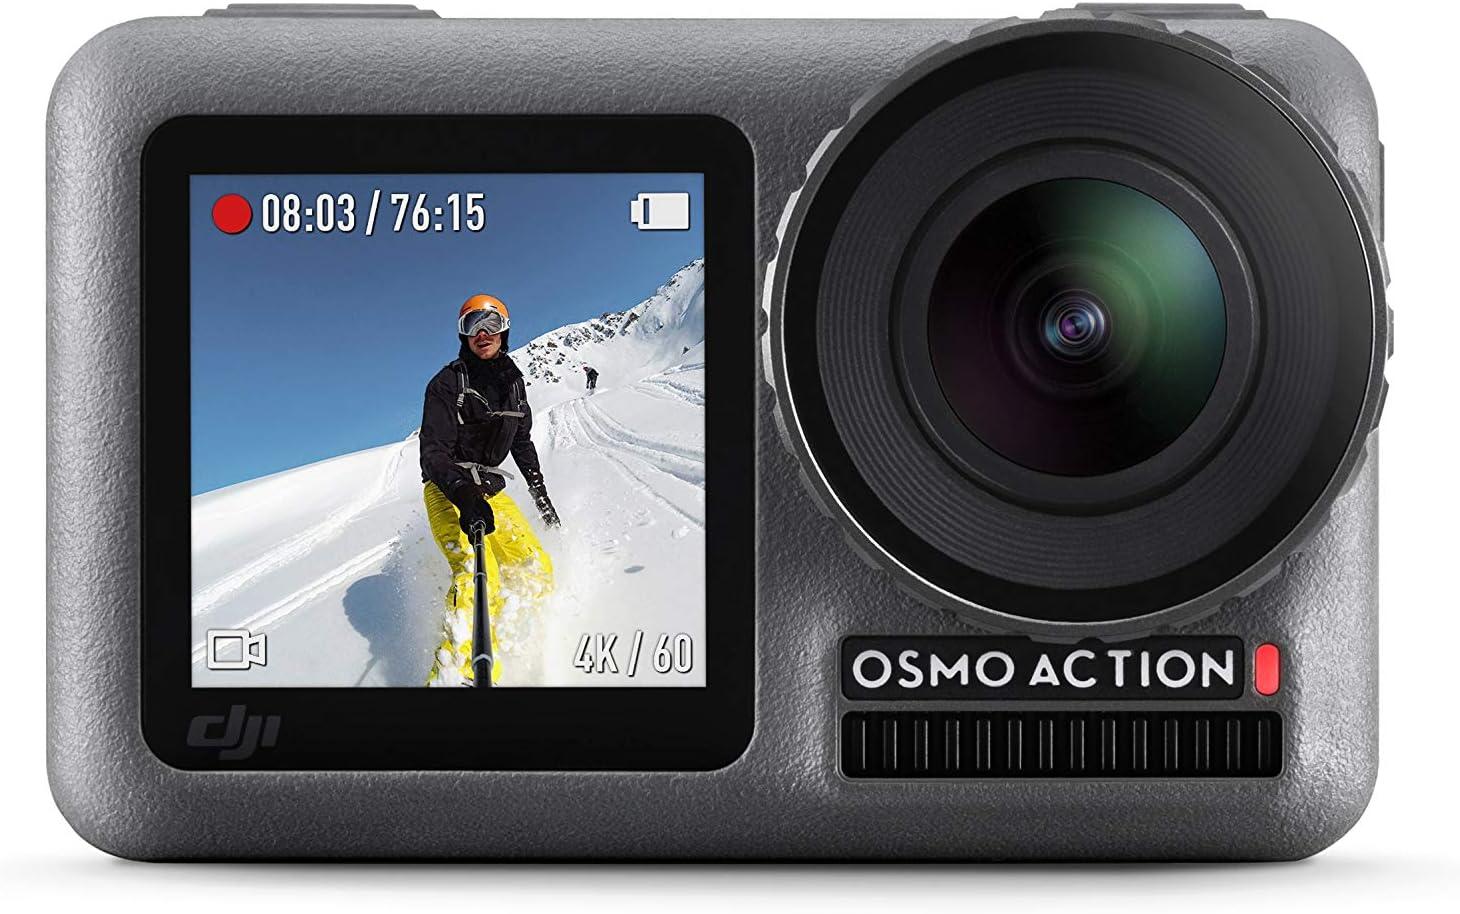 Dji Osmo Action Cam Digitale Actionkamera Mit 2 Kamera